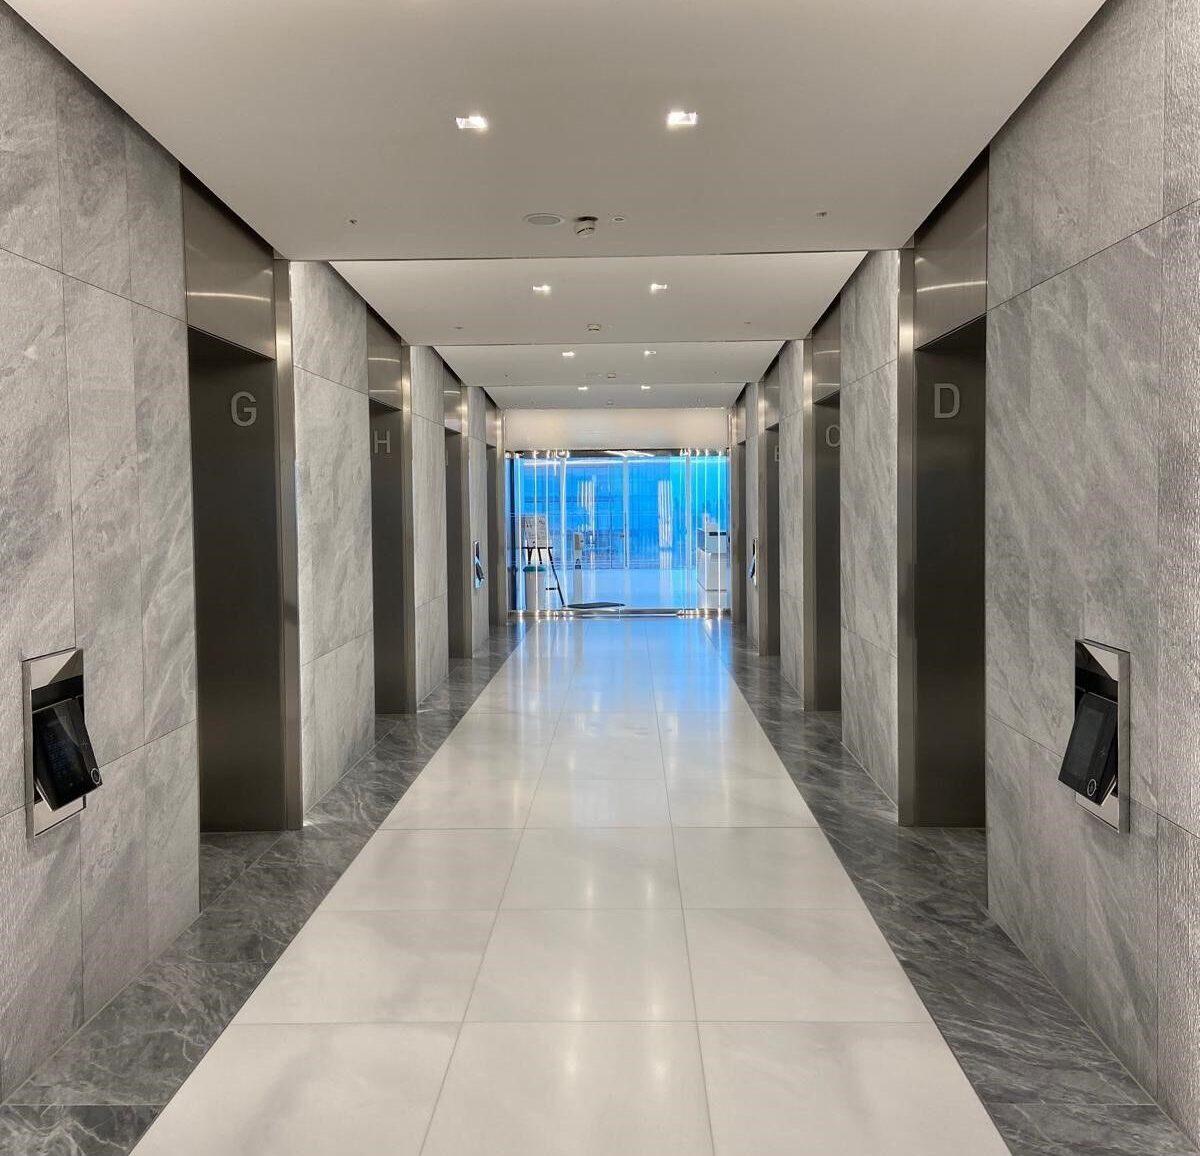 Lift Lobby Reveals